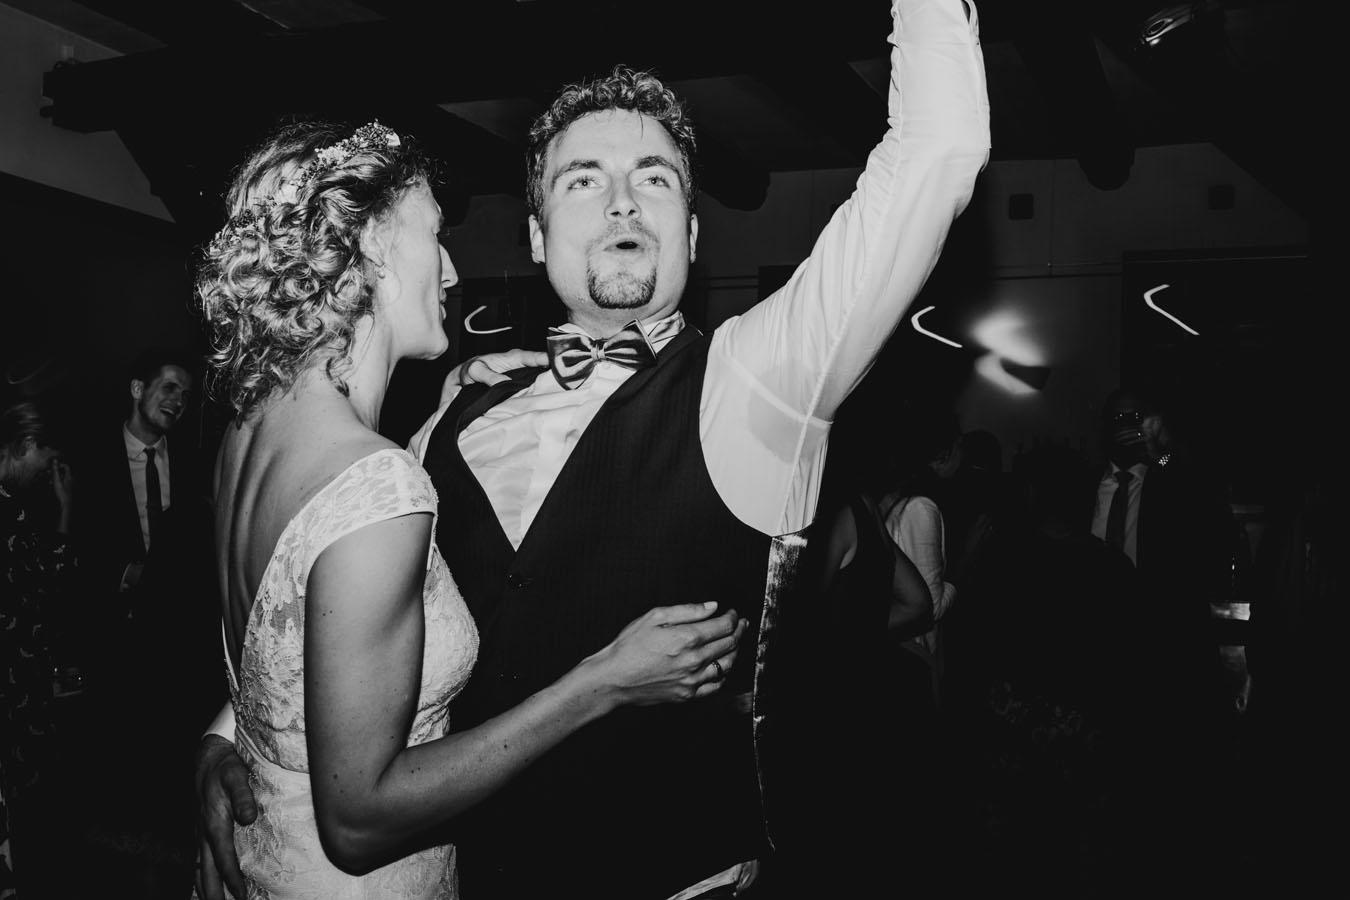 Wedding_233025